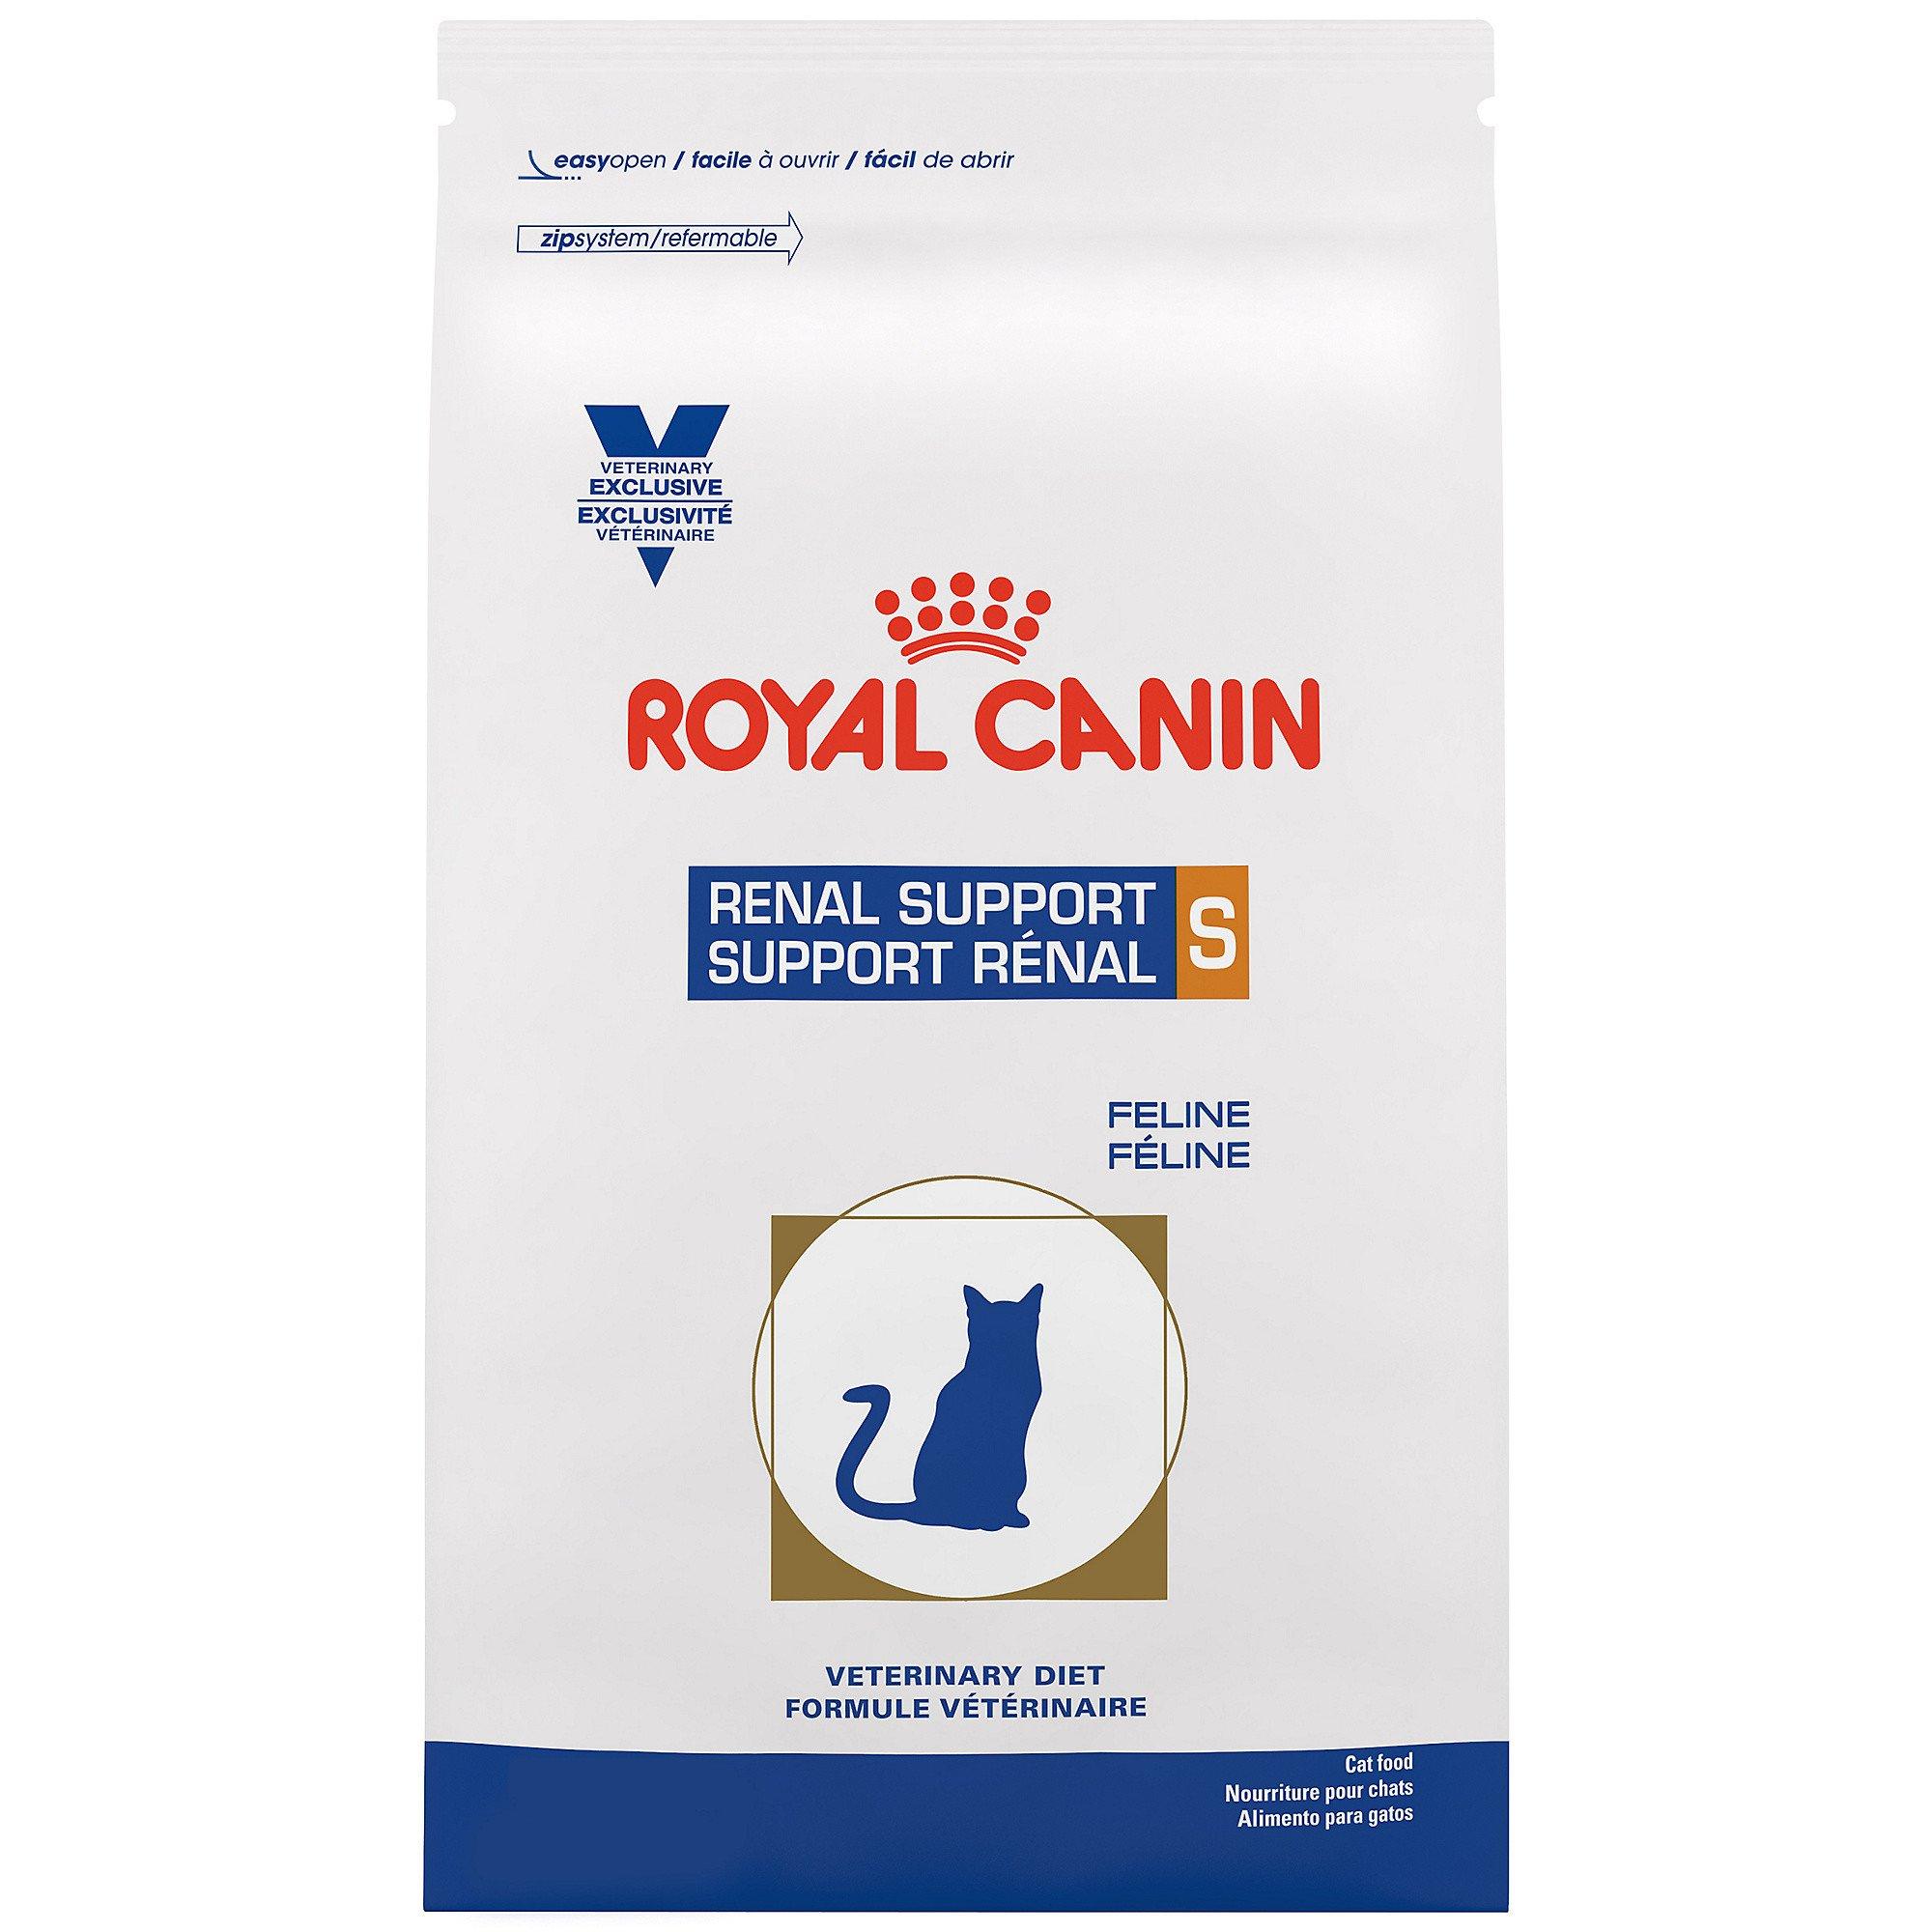 royal canin veterinary diet feline renal support s dry cat. Black Bedroom Furniture Sets. Home Design Ideas